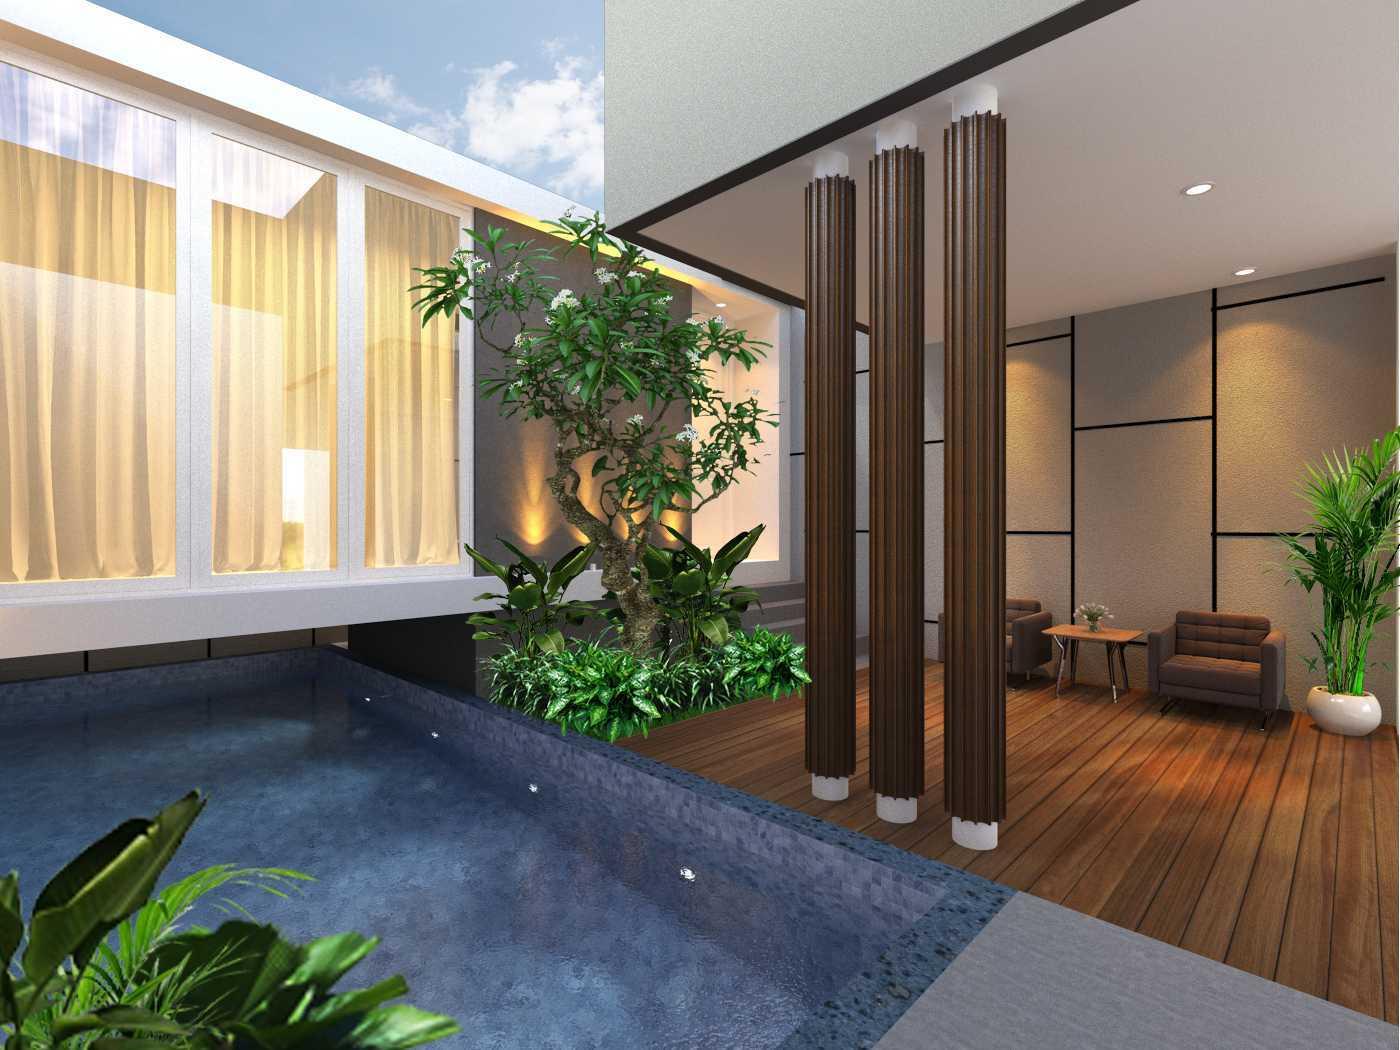 Sense Studio Residence - Surabaya Surabaya, Kota Sby, Jawa Timur, Indonesia Surabaya, Kota Sby, Jawa Timur, Indonesia Sense-Studio-Rumah-Tinggal-Kertomenanggal  51655